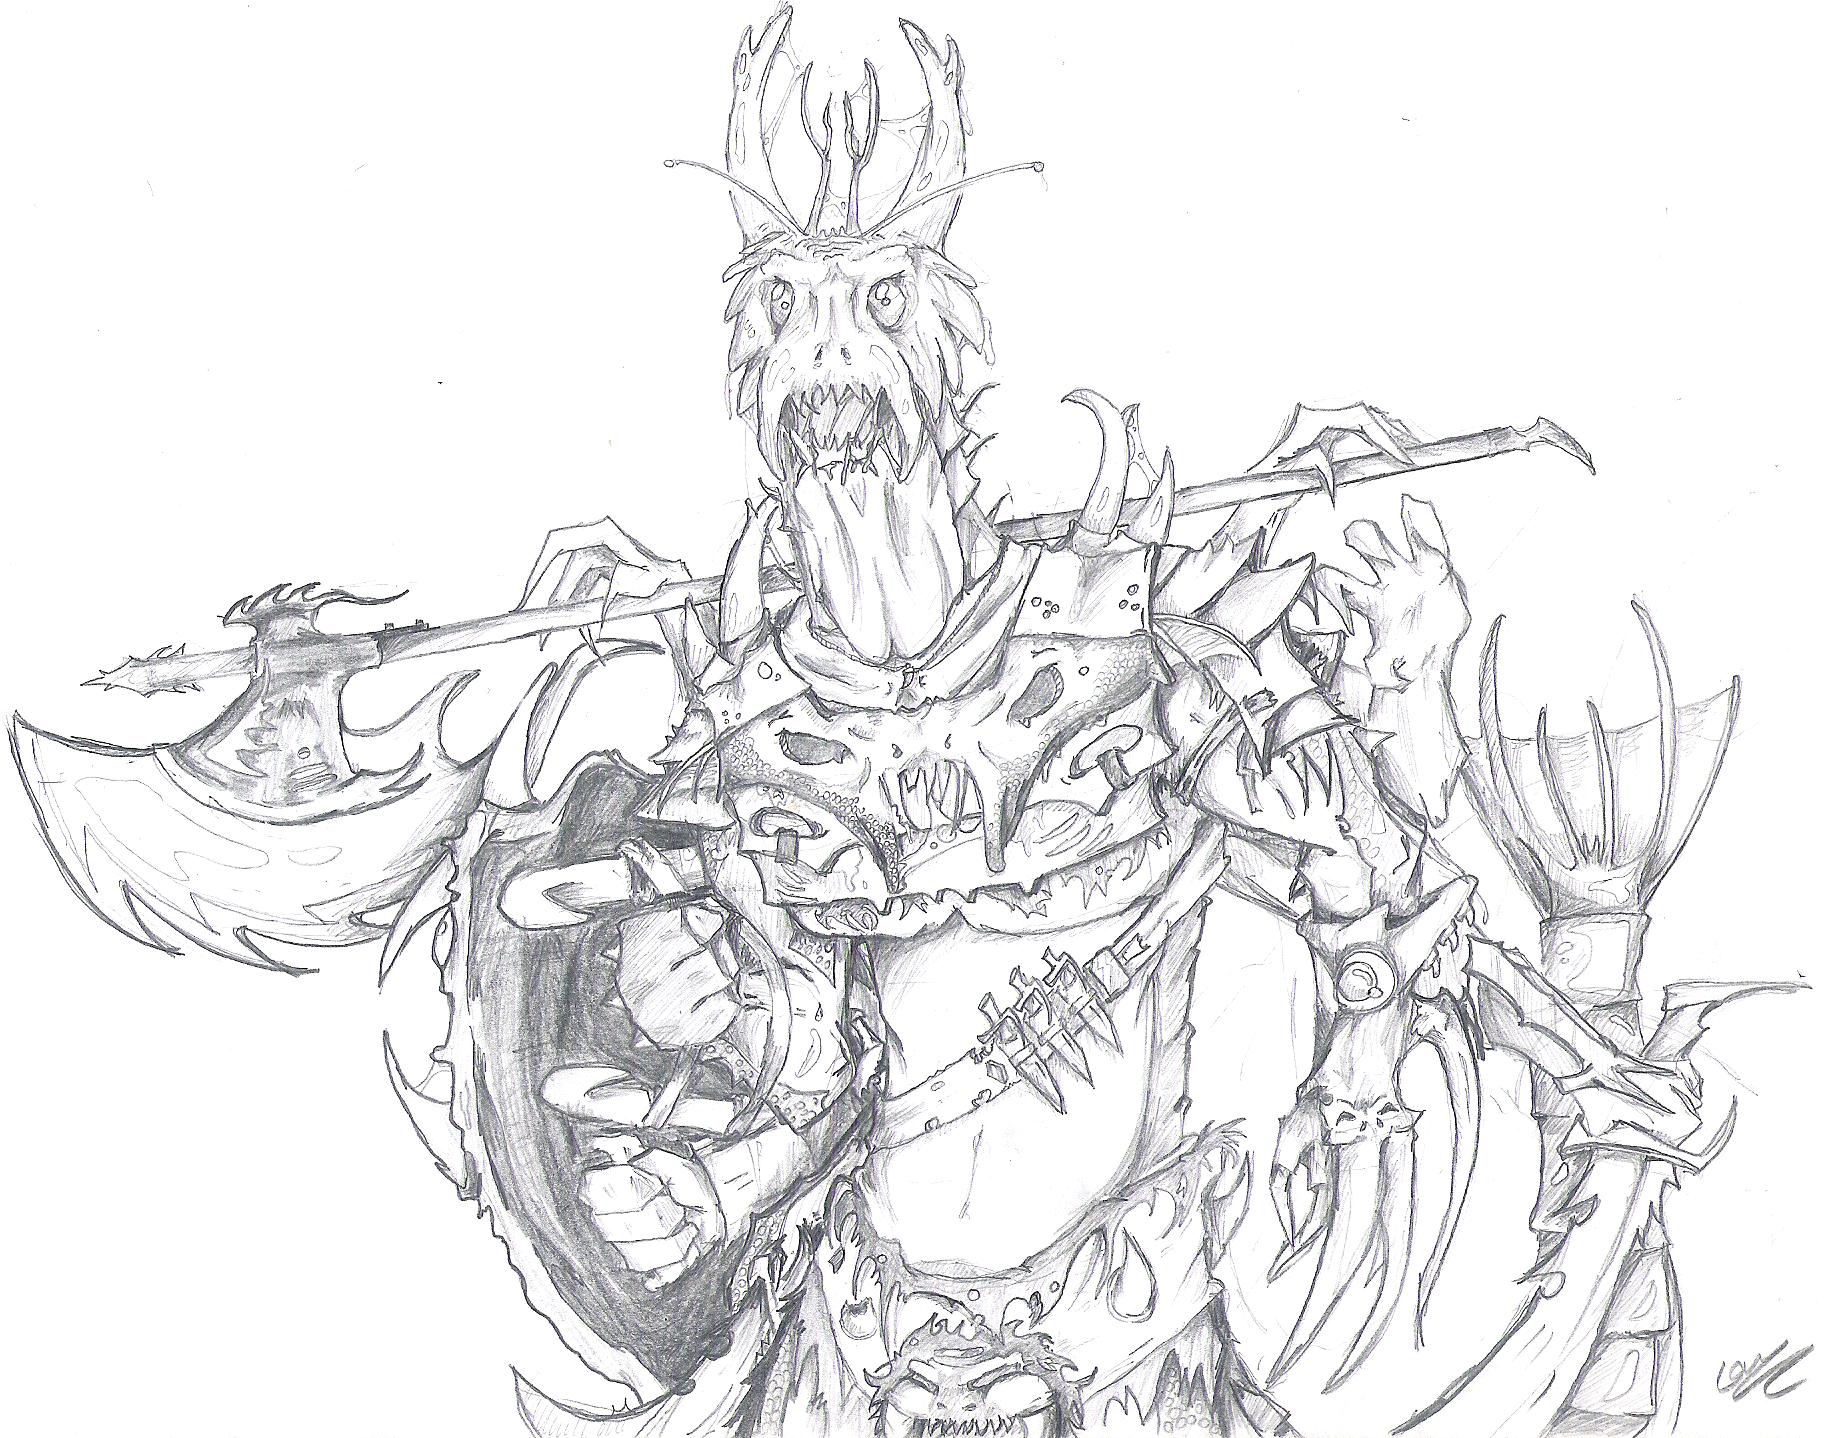 An Humanoid Based on Chaurus